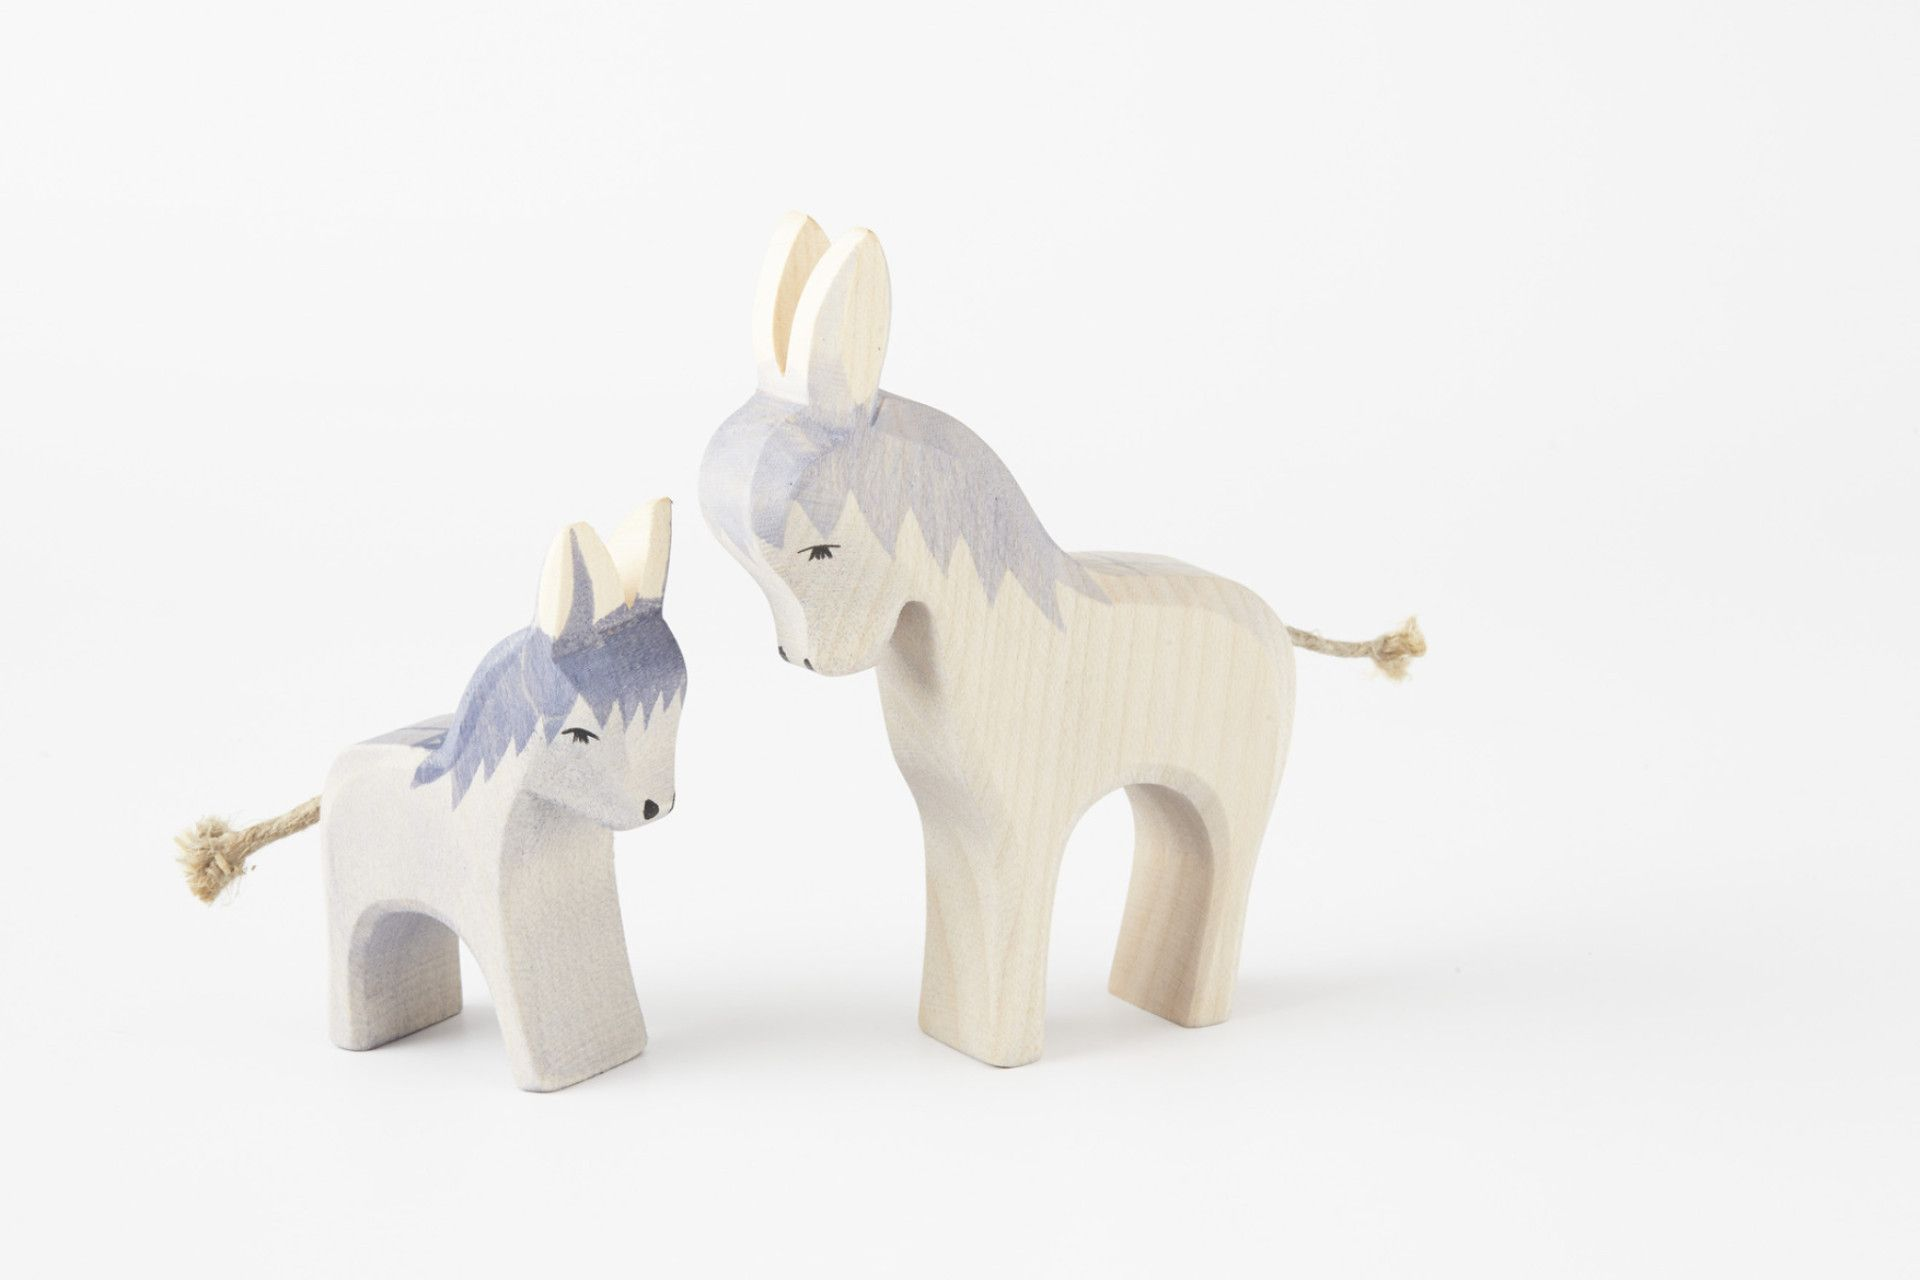 donkey | wooden toys | wooden animal toys, wooden animals